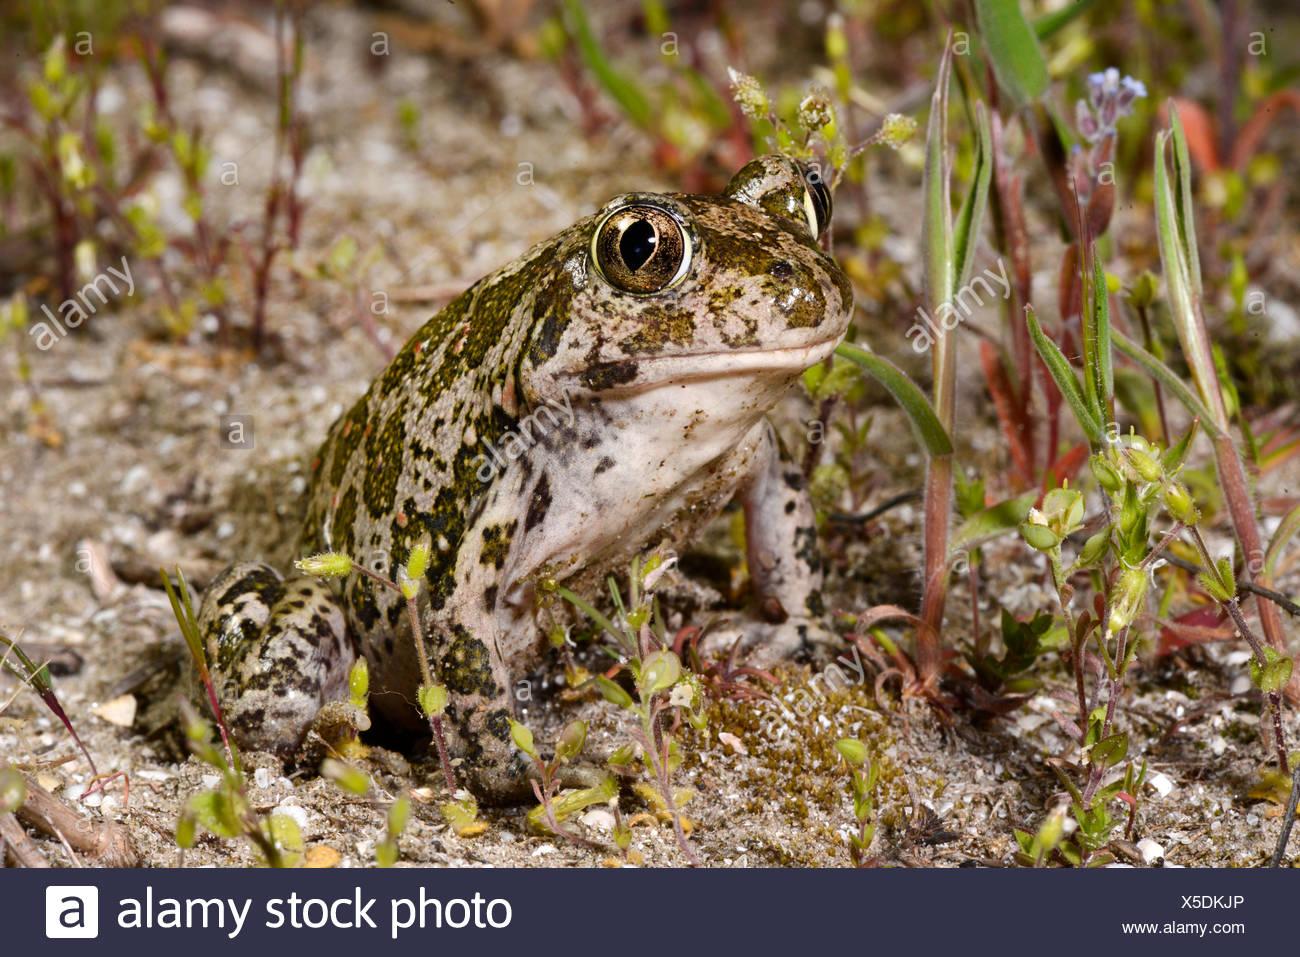 Eastern European spadefoot, Syrian spadefoot (Pelobates syriacus), sitting on sandy ground, Romania, Dobrudscha, Donaudelta, Donau-Delta, Vadu Stock Photo